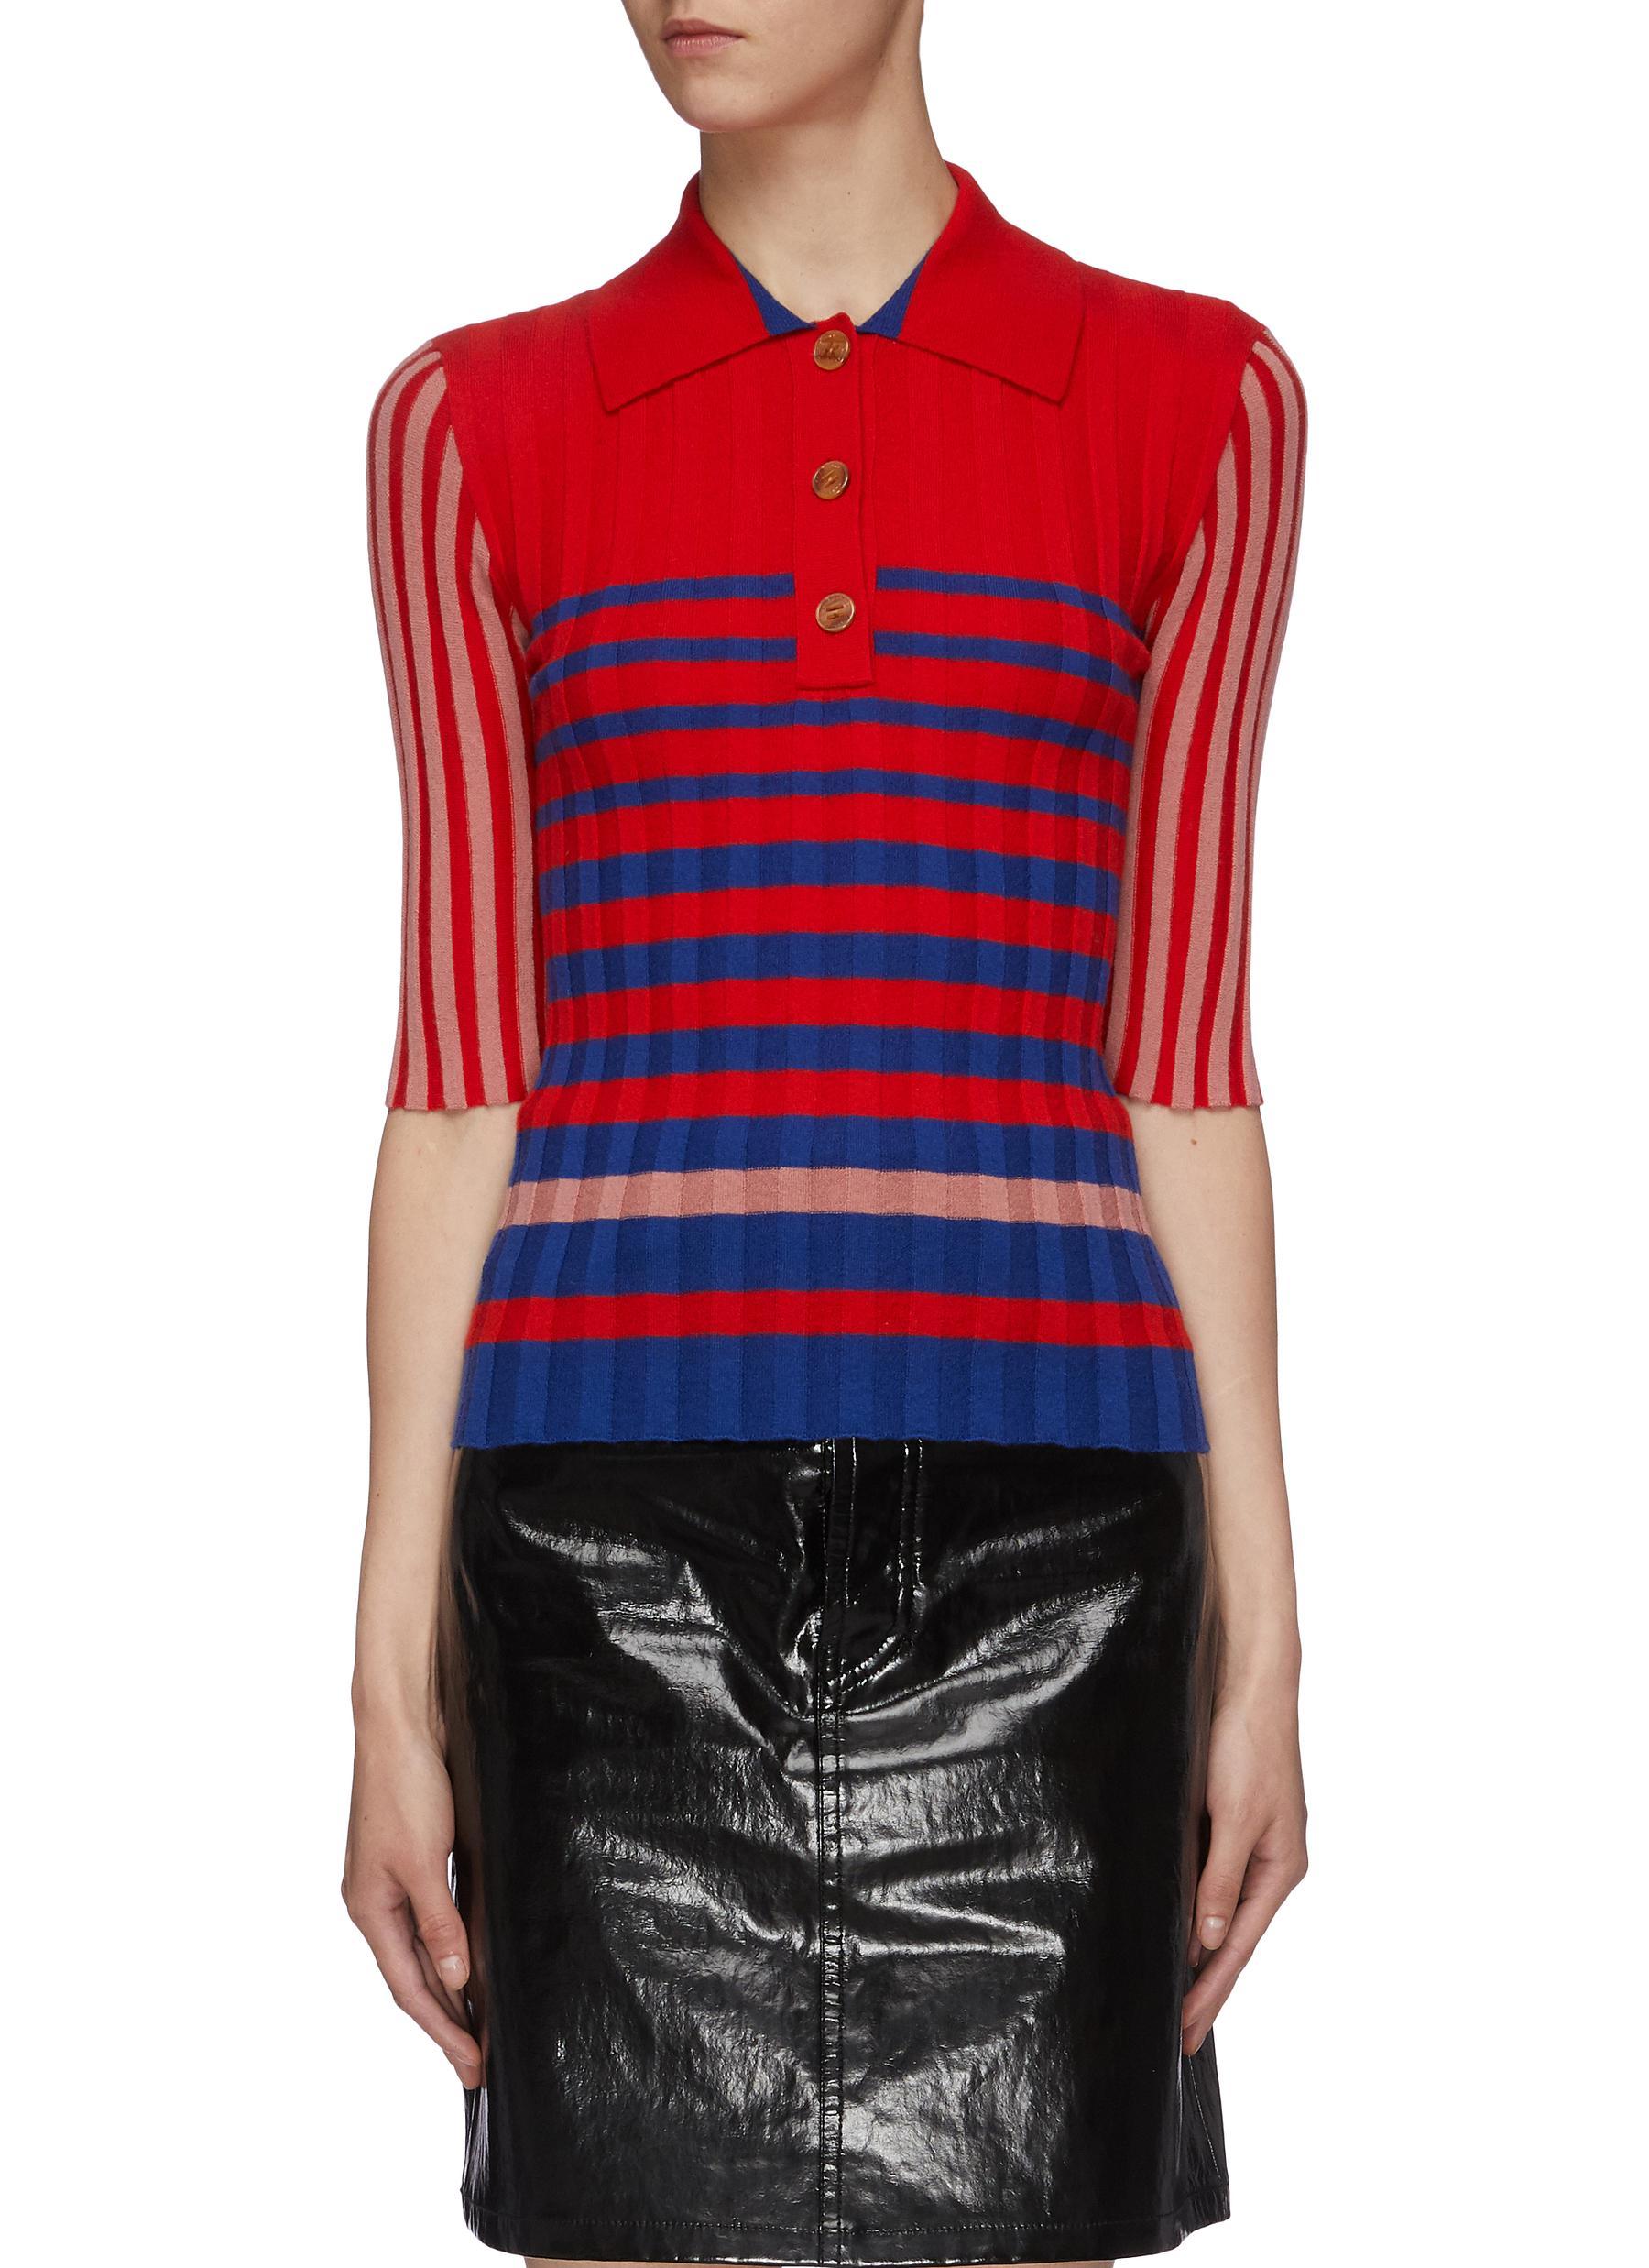 Mix stripe cashmere rib knit polo shirt by Sonia Rykiel